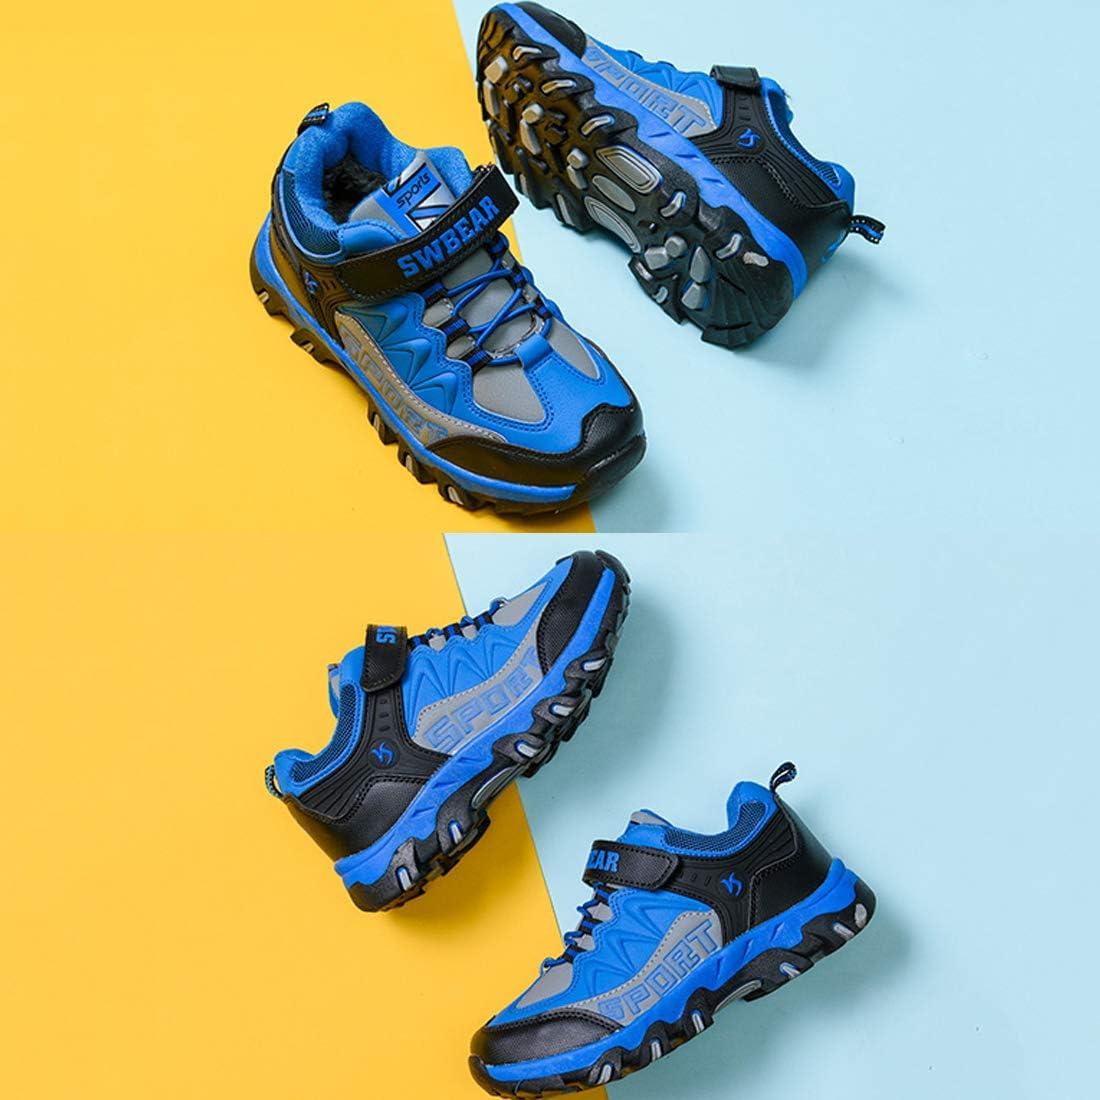 Rokiemen Kids Trekking Hiking Shoes Children Lightweight Waterproof Sneakers Outdoor Walking Camping Shoes for Boys Girls